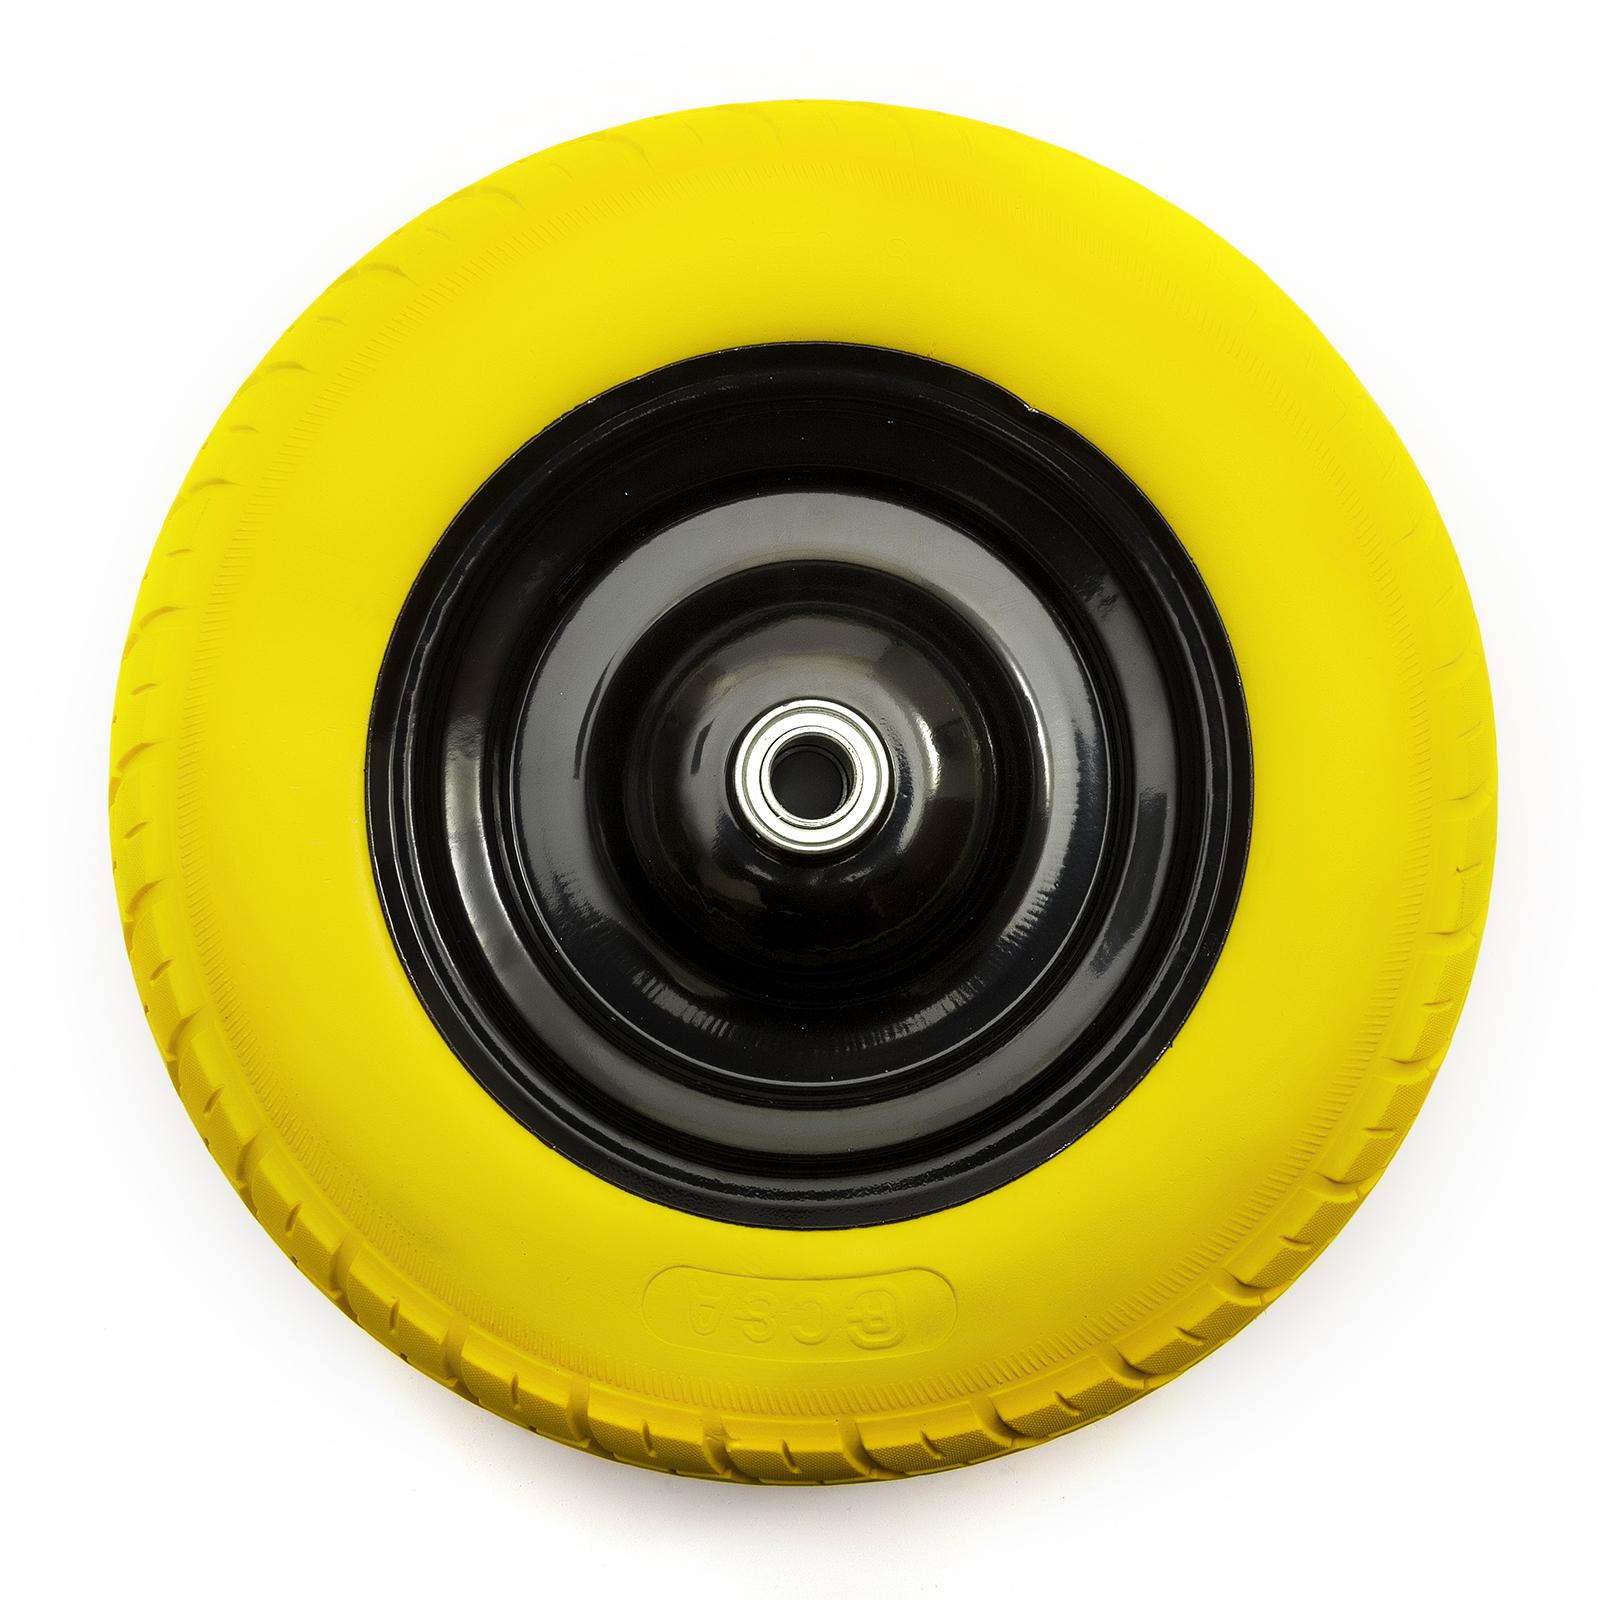 pu 14 39 39 m tal brouette roue et pneumatique punctureproof brouette chariot ebay. Black Bedroom Furniture Sets. Home Design Ideas